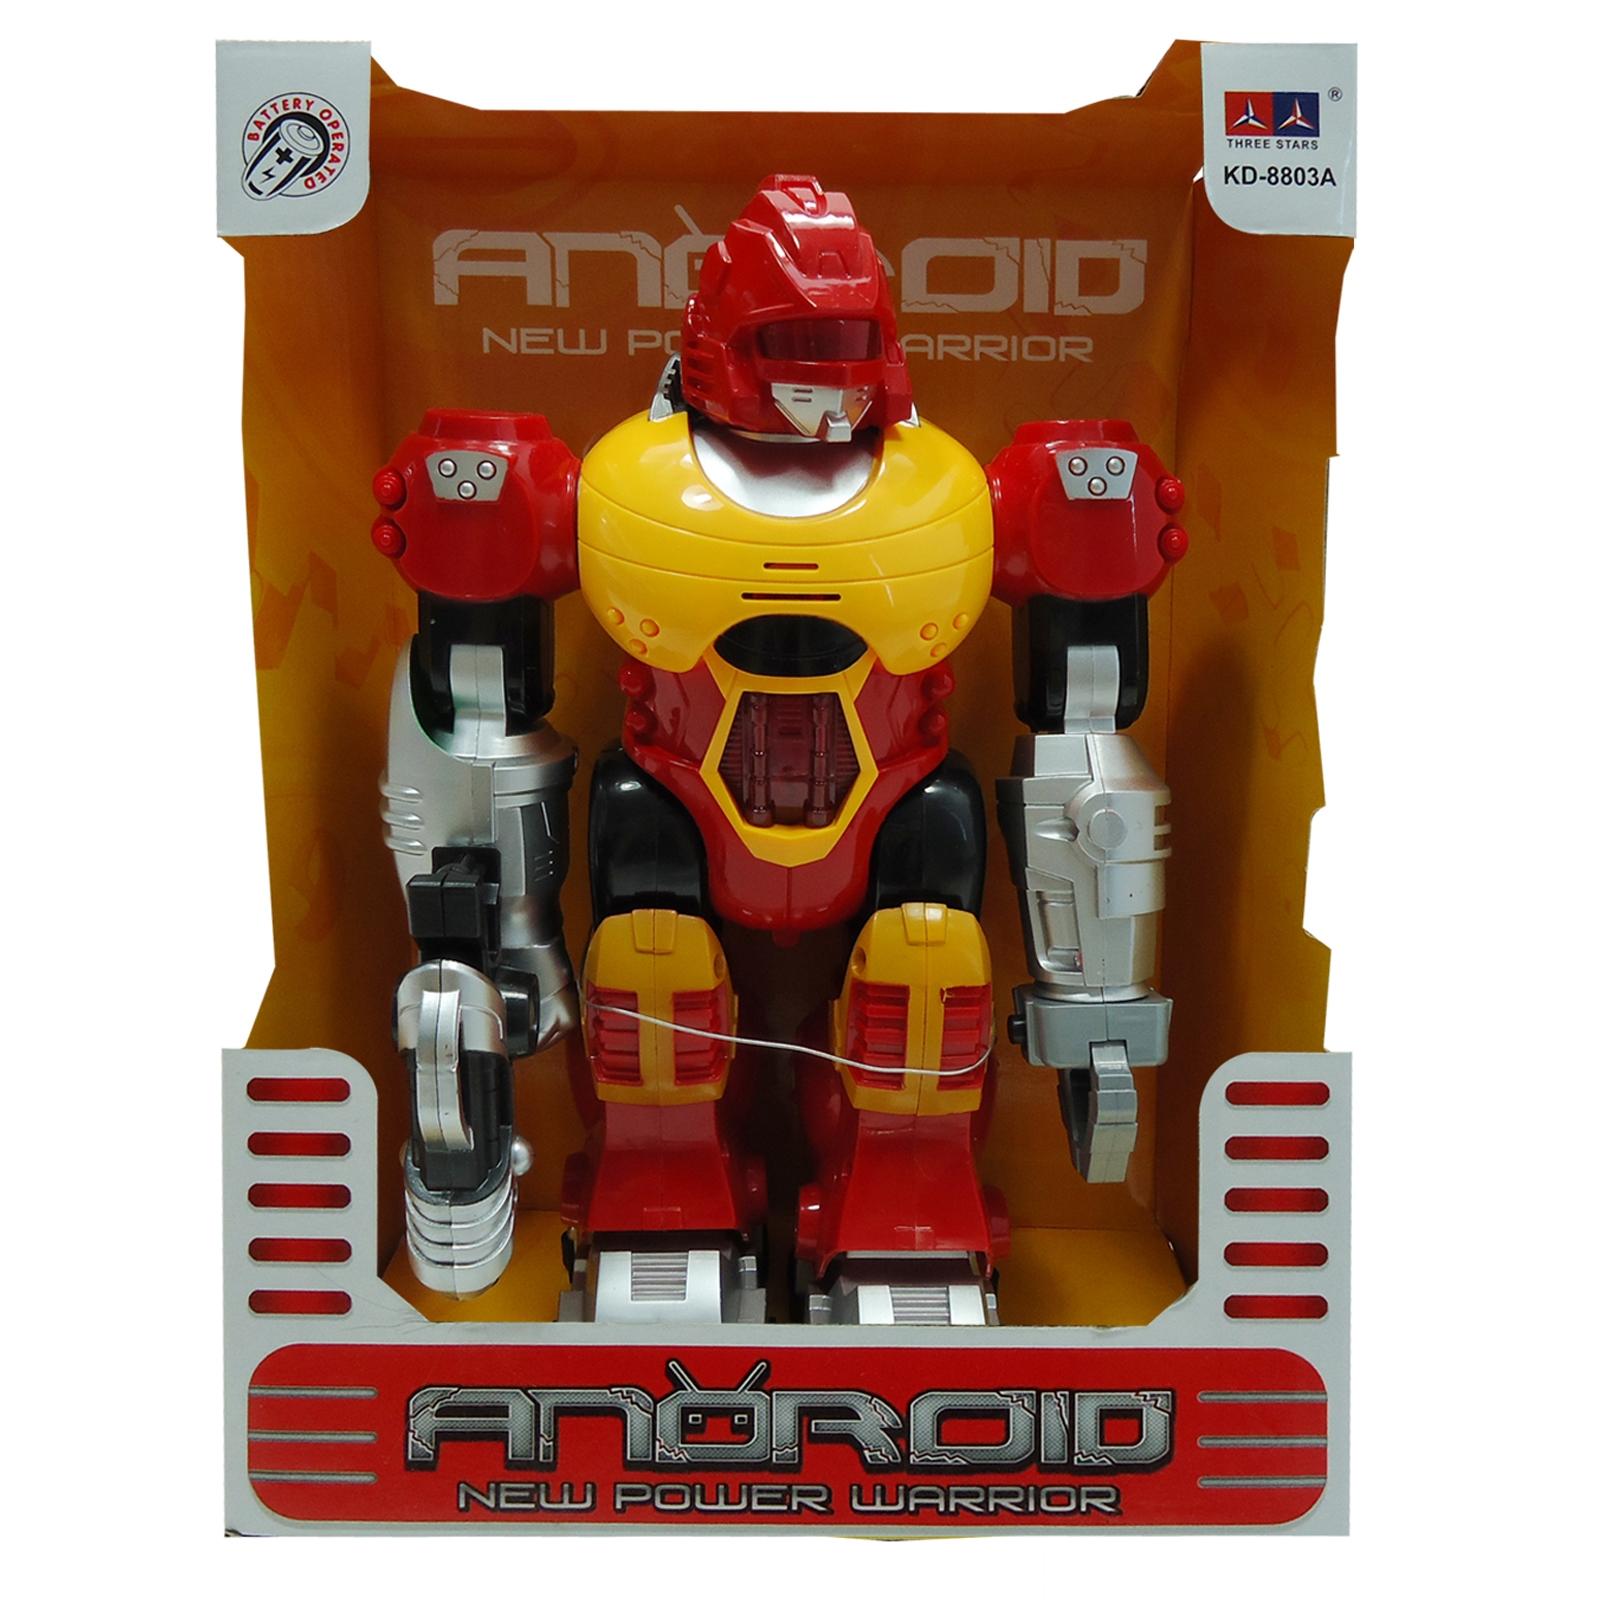 Power Warrior Light Up Walking Super Robot Action Figure - Blue